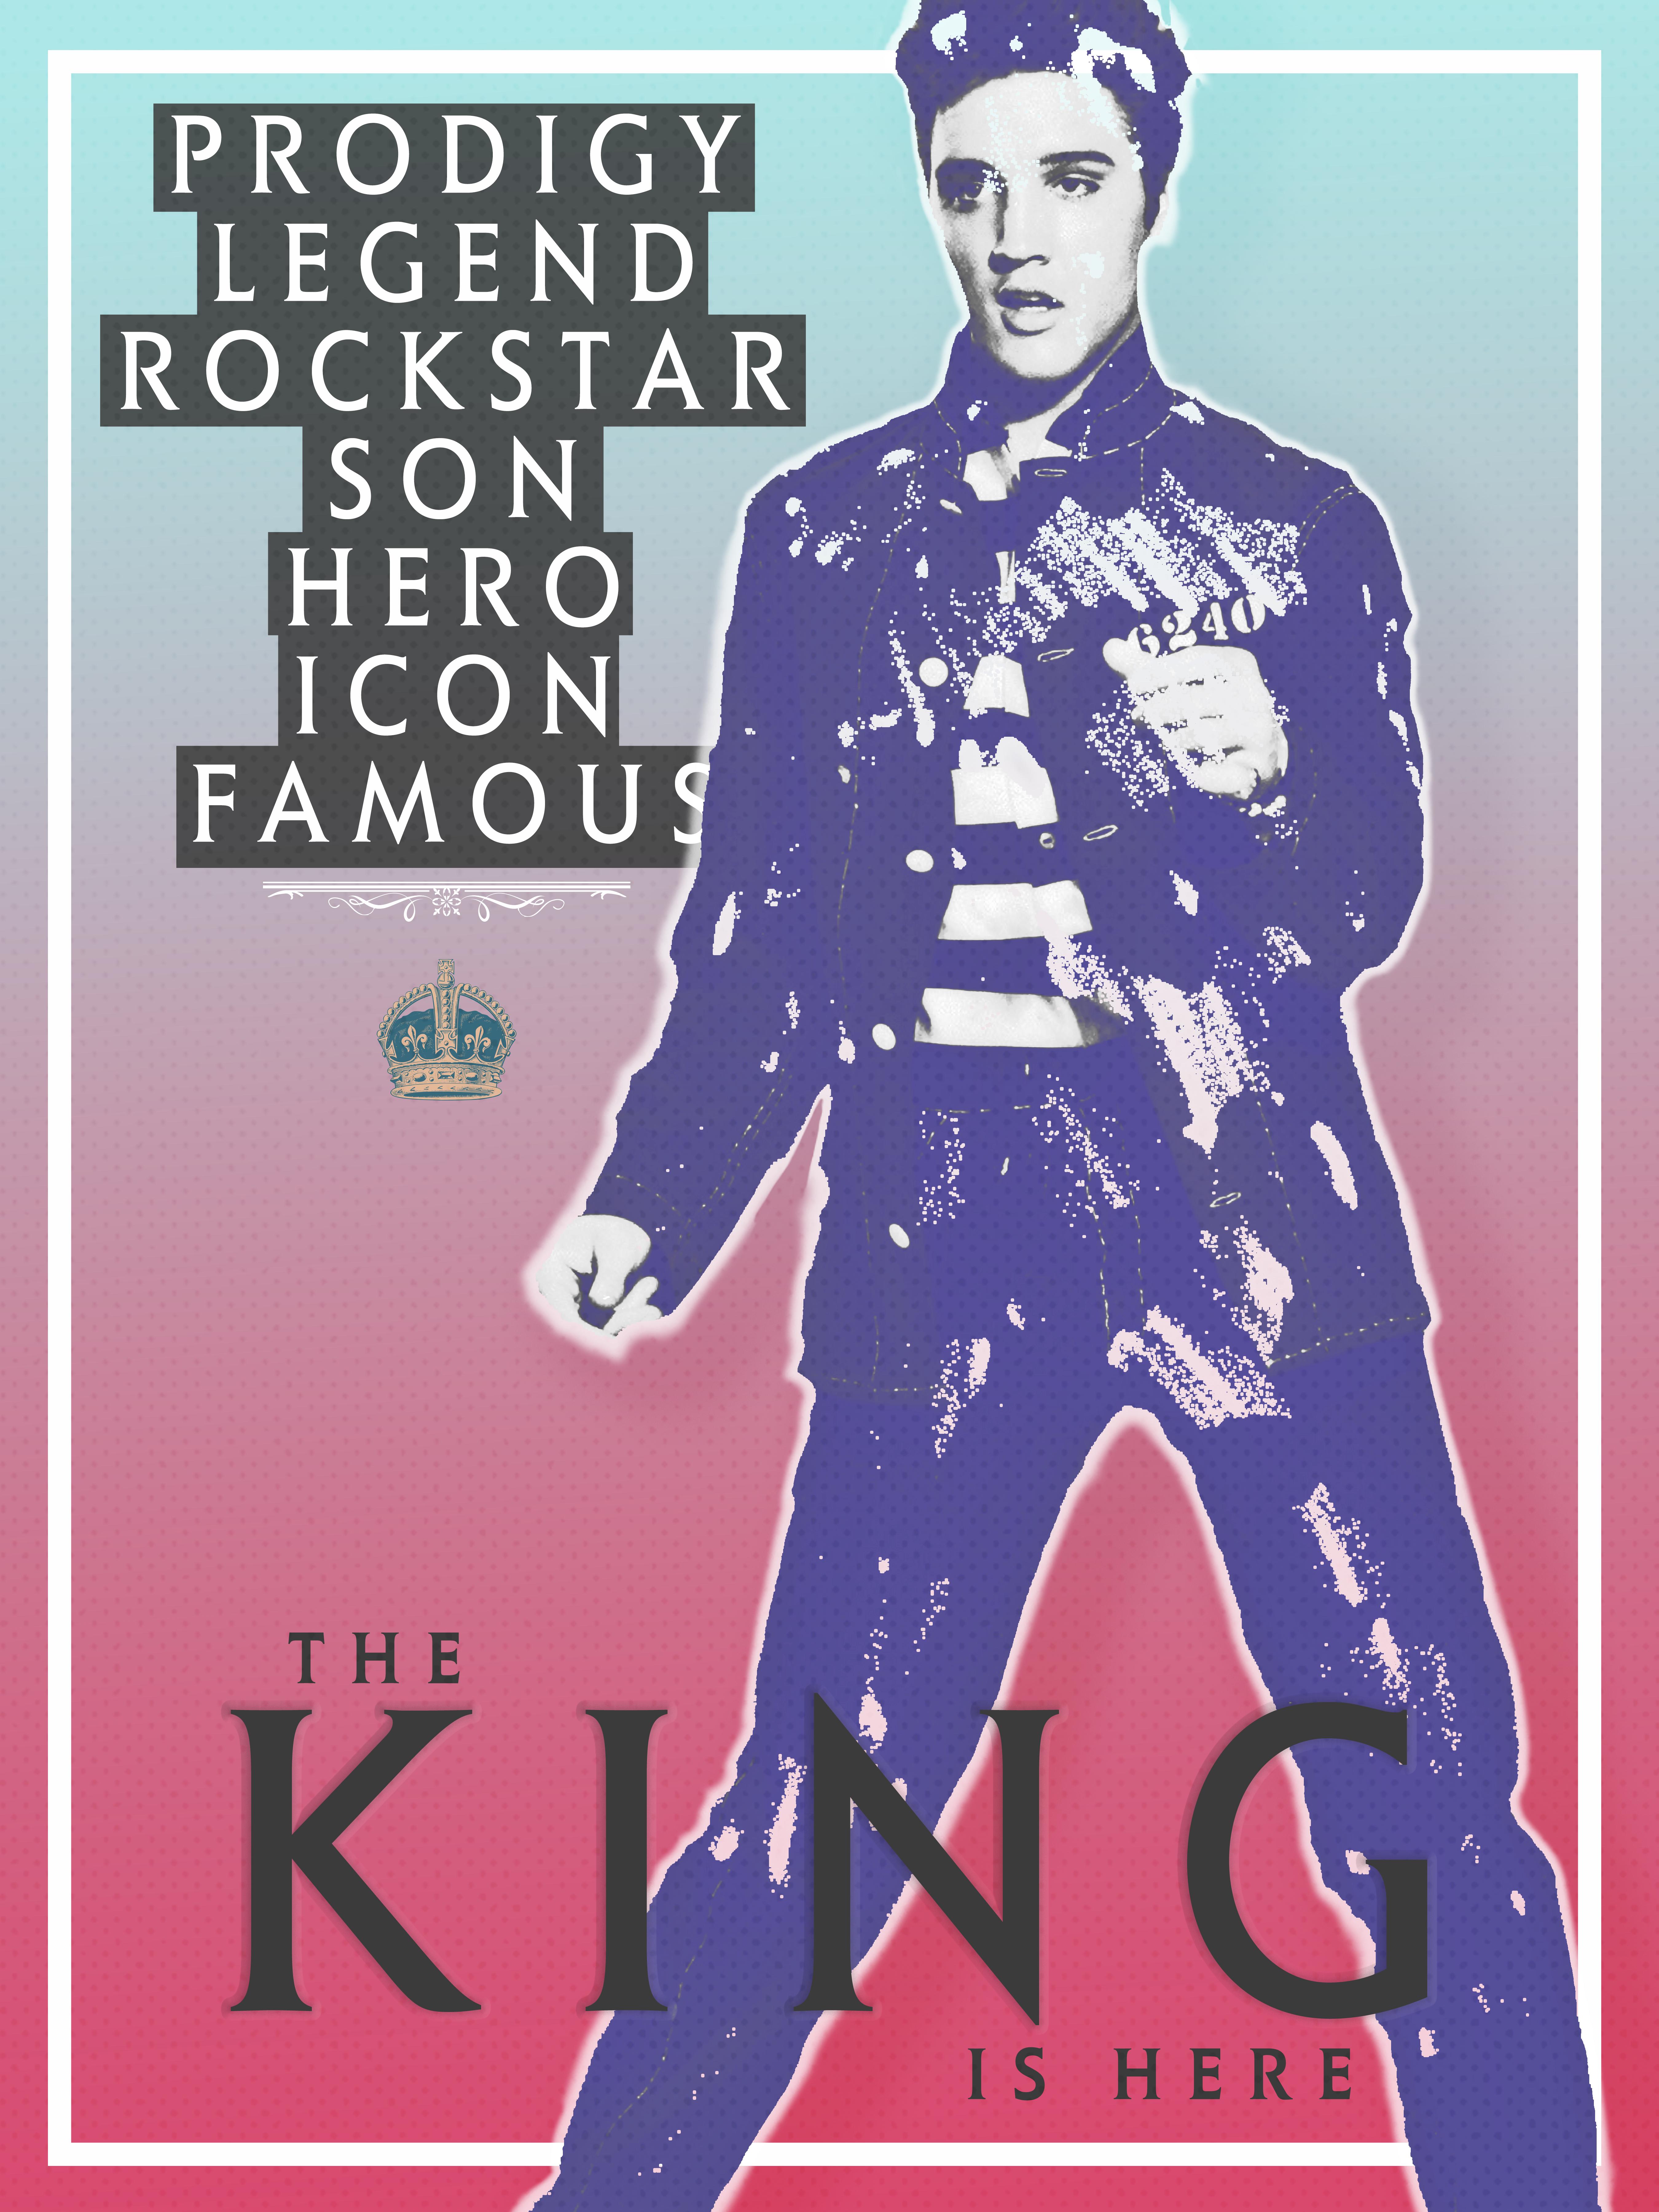 5c708d2eb1e94 Hintergrundbilder : Berühmtheit, Elvis Presley, Poster 5400x7200 ...